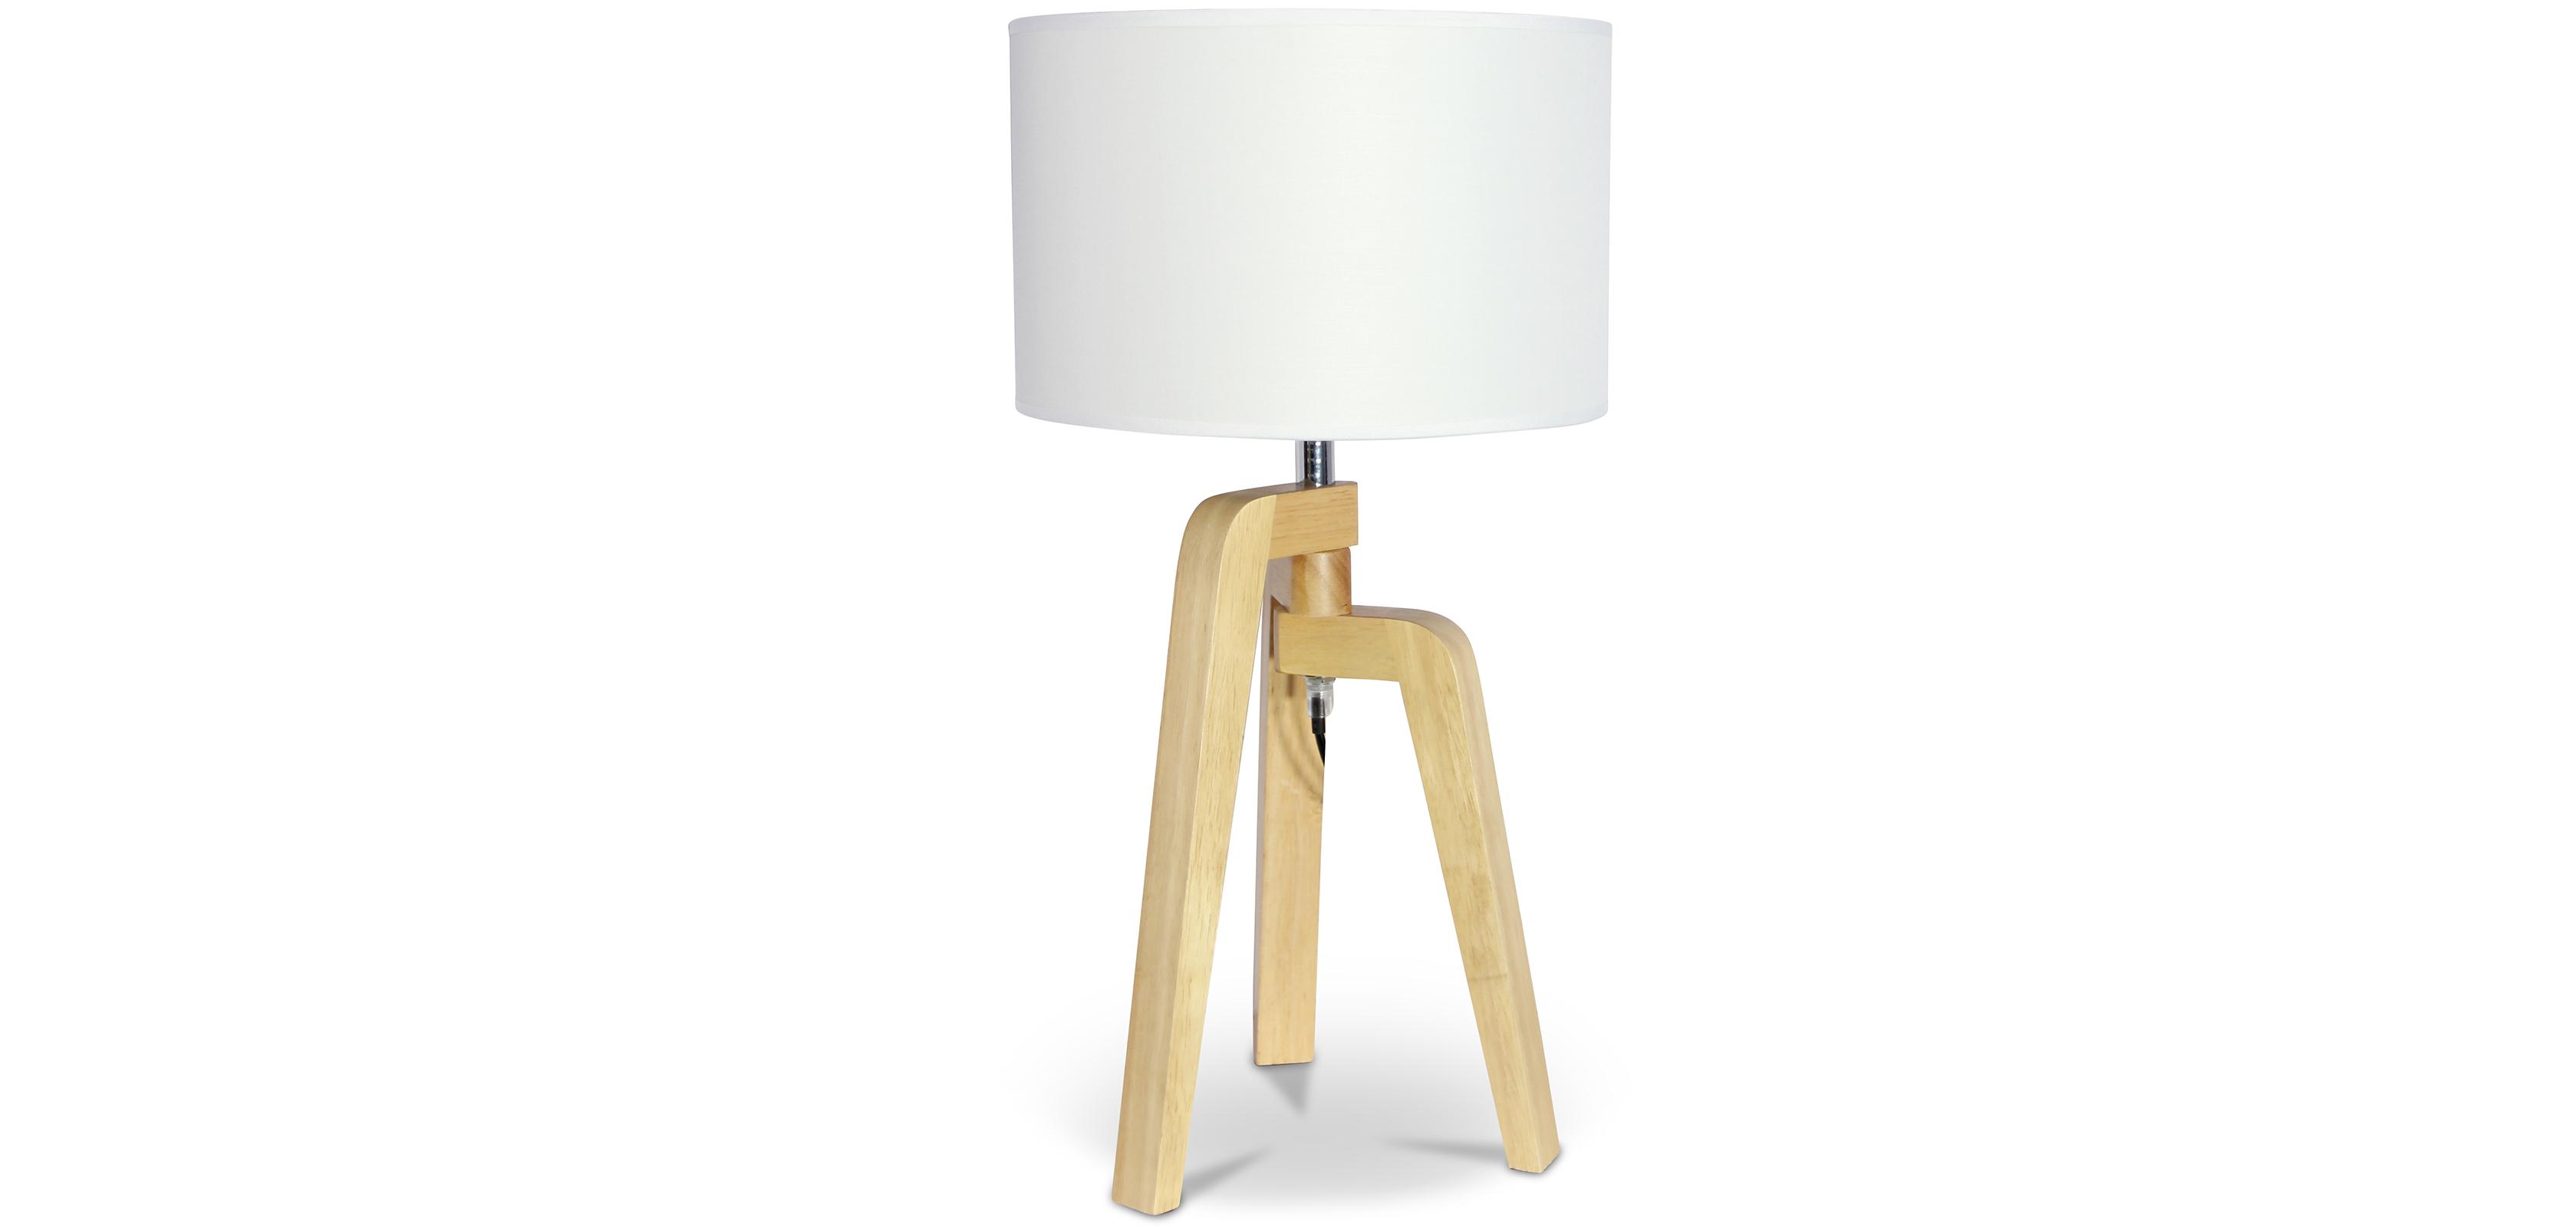 lampe tr pied style nordique bois. Black Bedroom Furniture Sets. Home Design Ideas